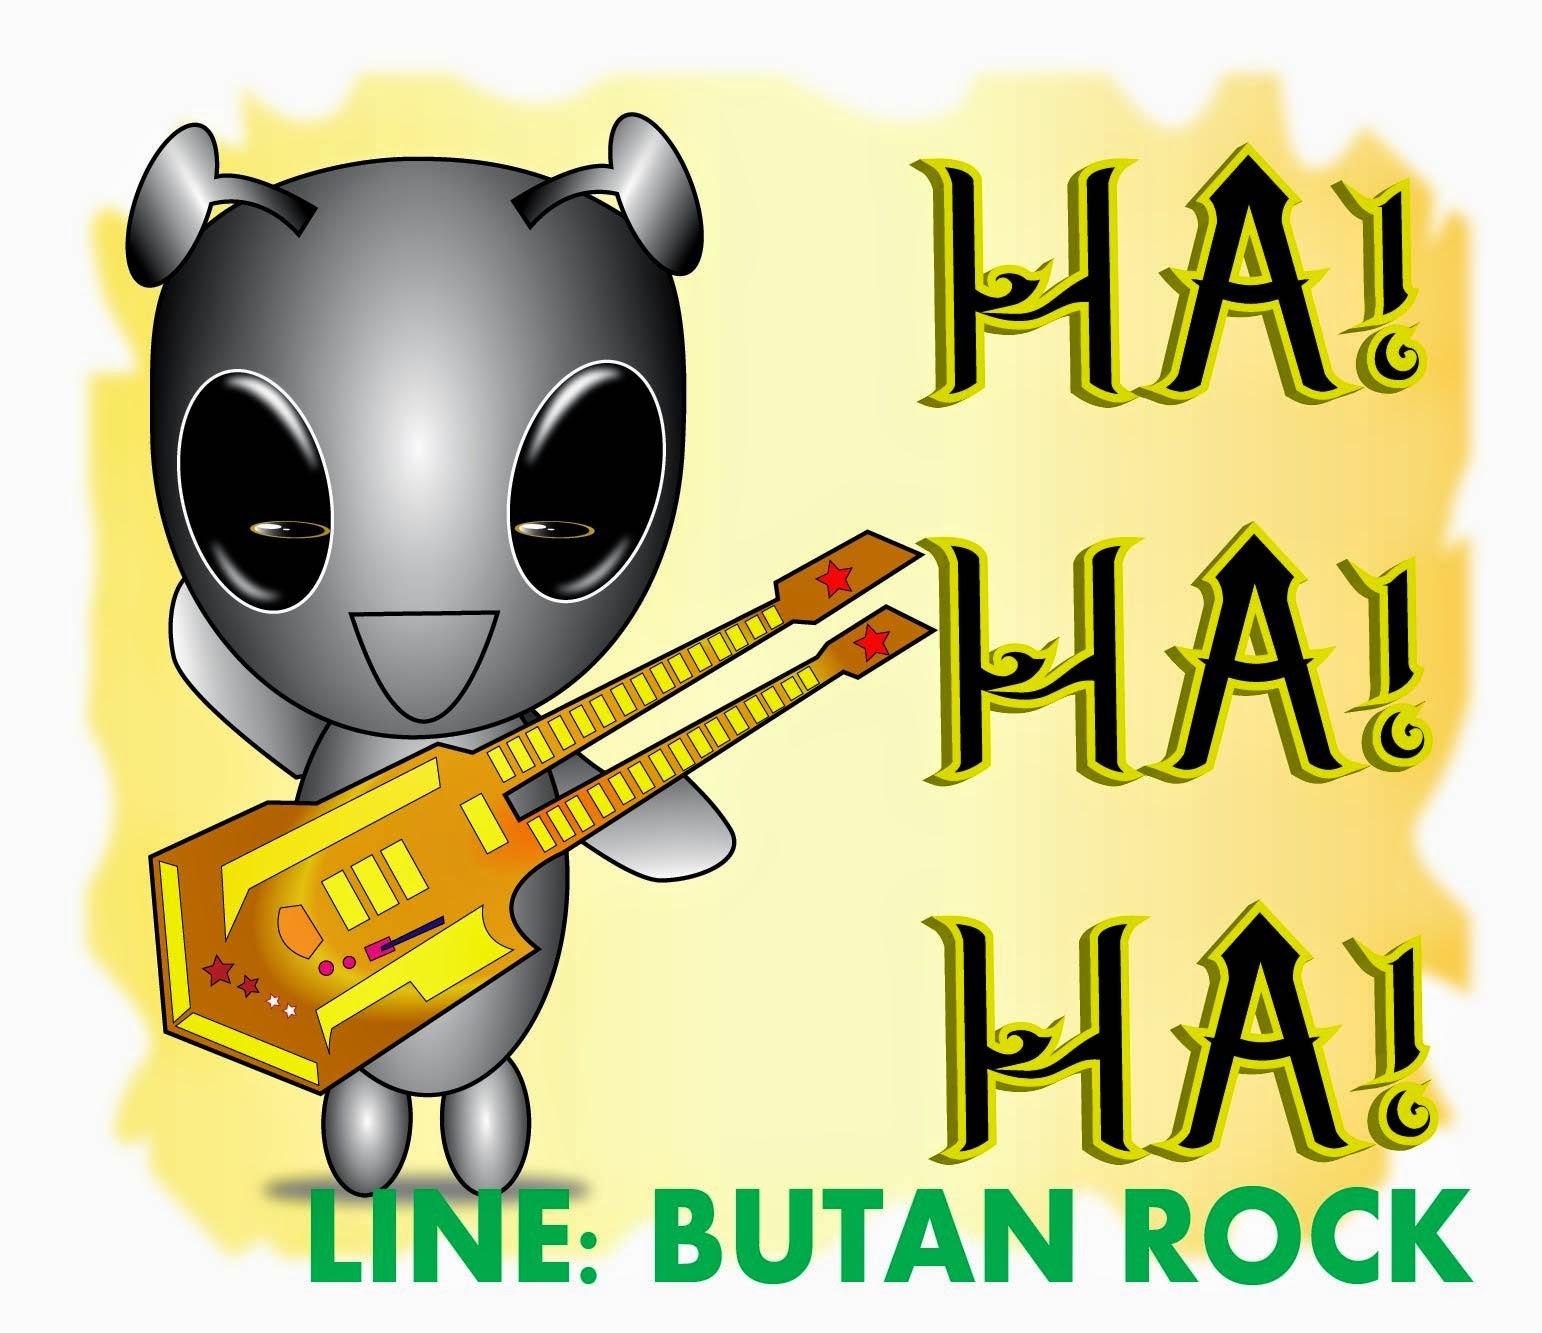 Butan Rock Gift Line Sticker